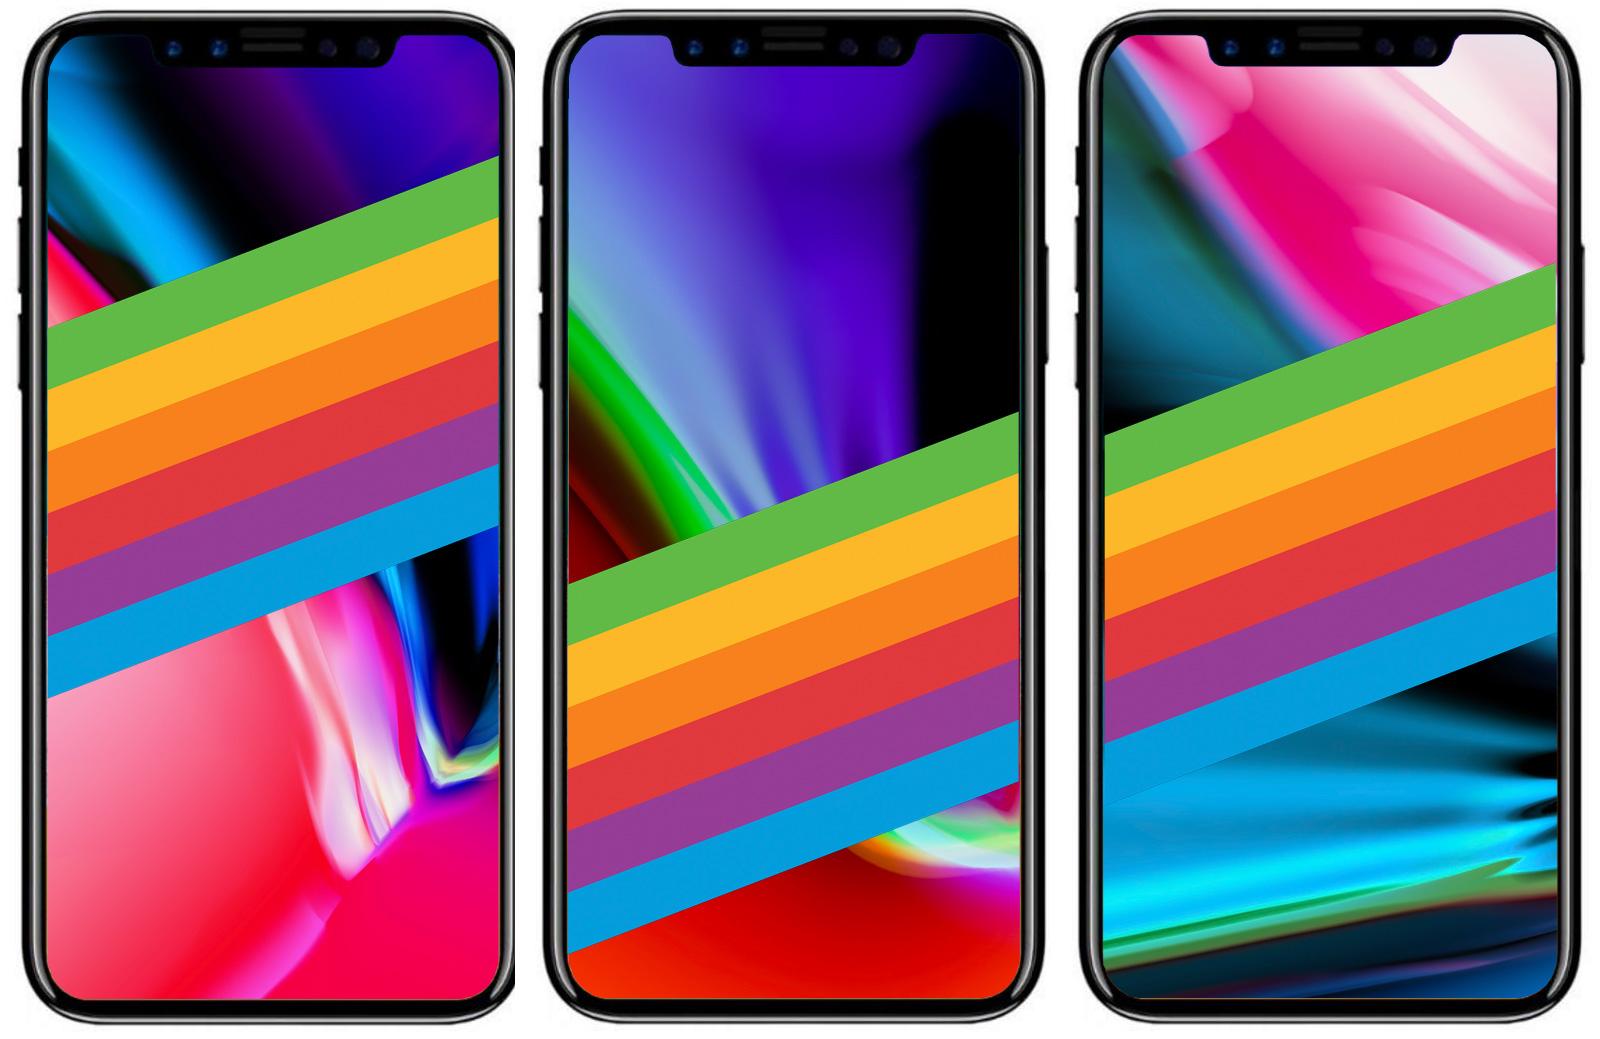 Fondos de pantalla del arcoiris de Apple para iPhone